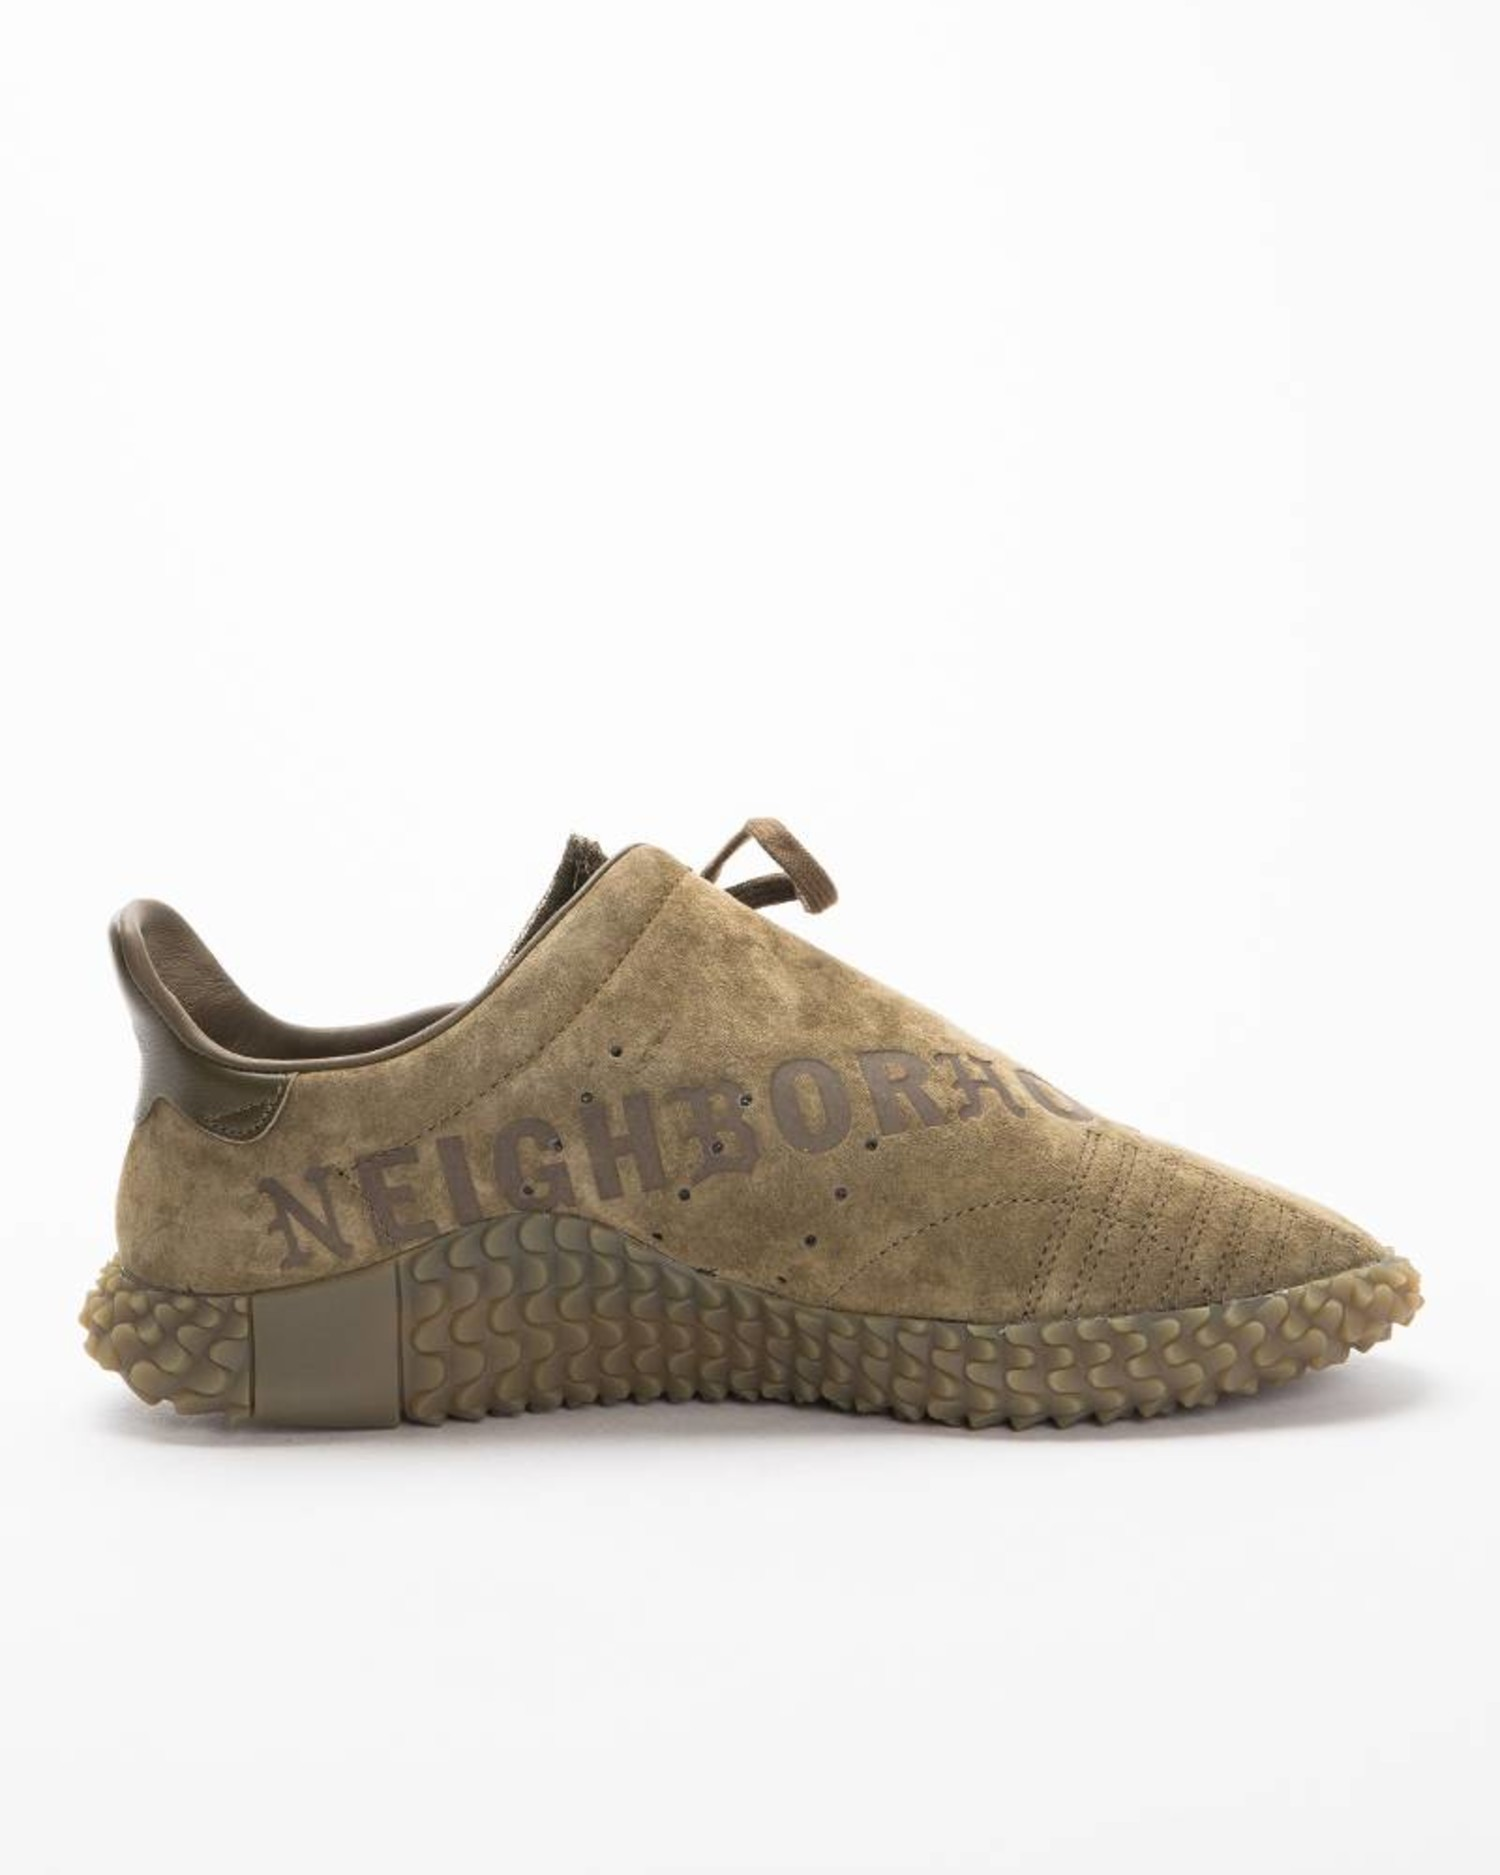 Adidas X Neighbourhood Kamanda 01 Trace Olive